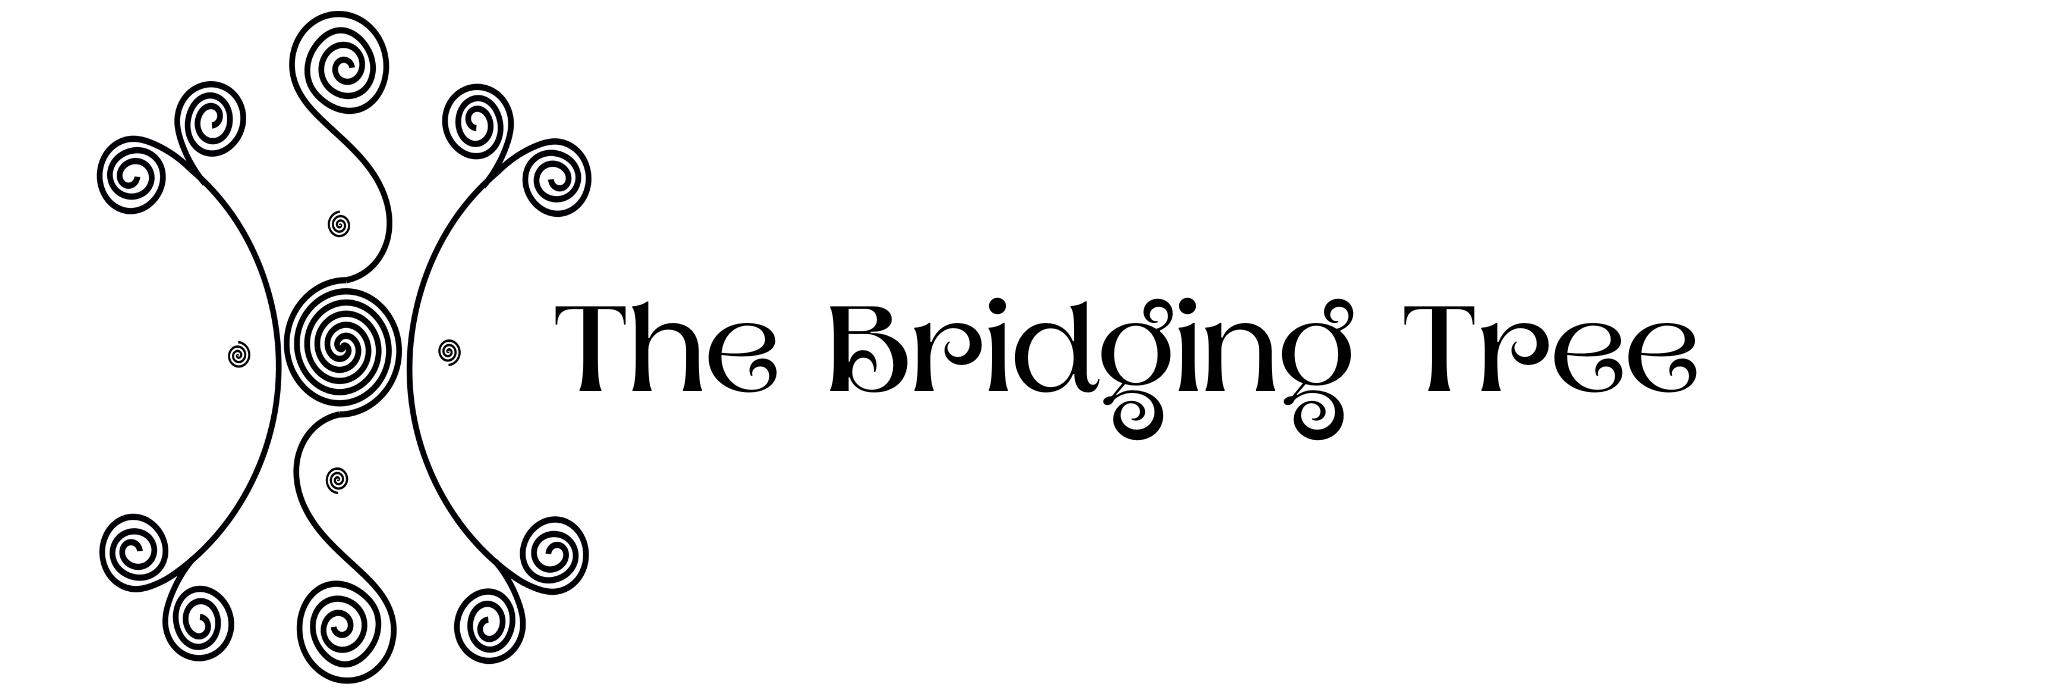 The Bridging Tree